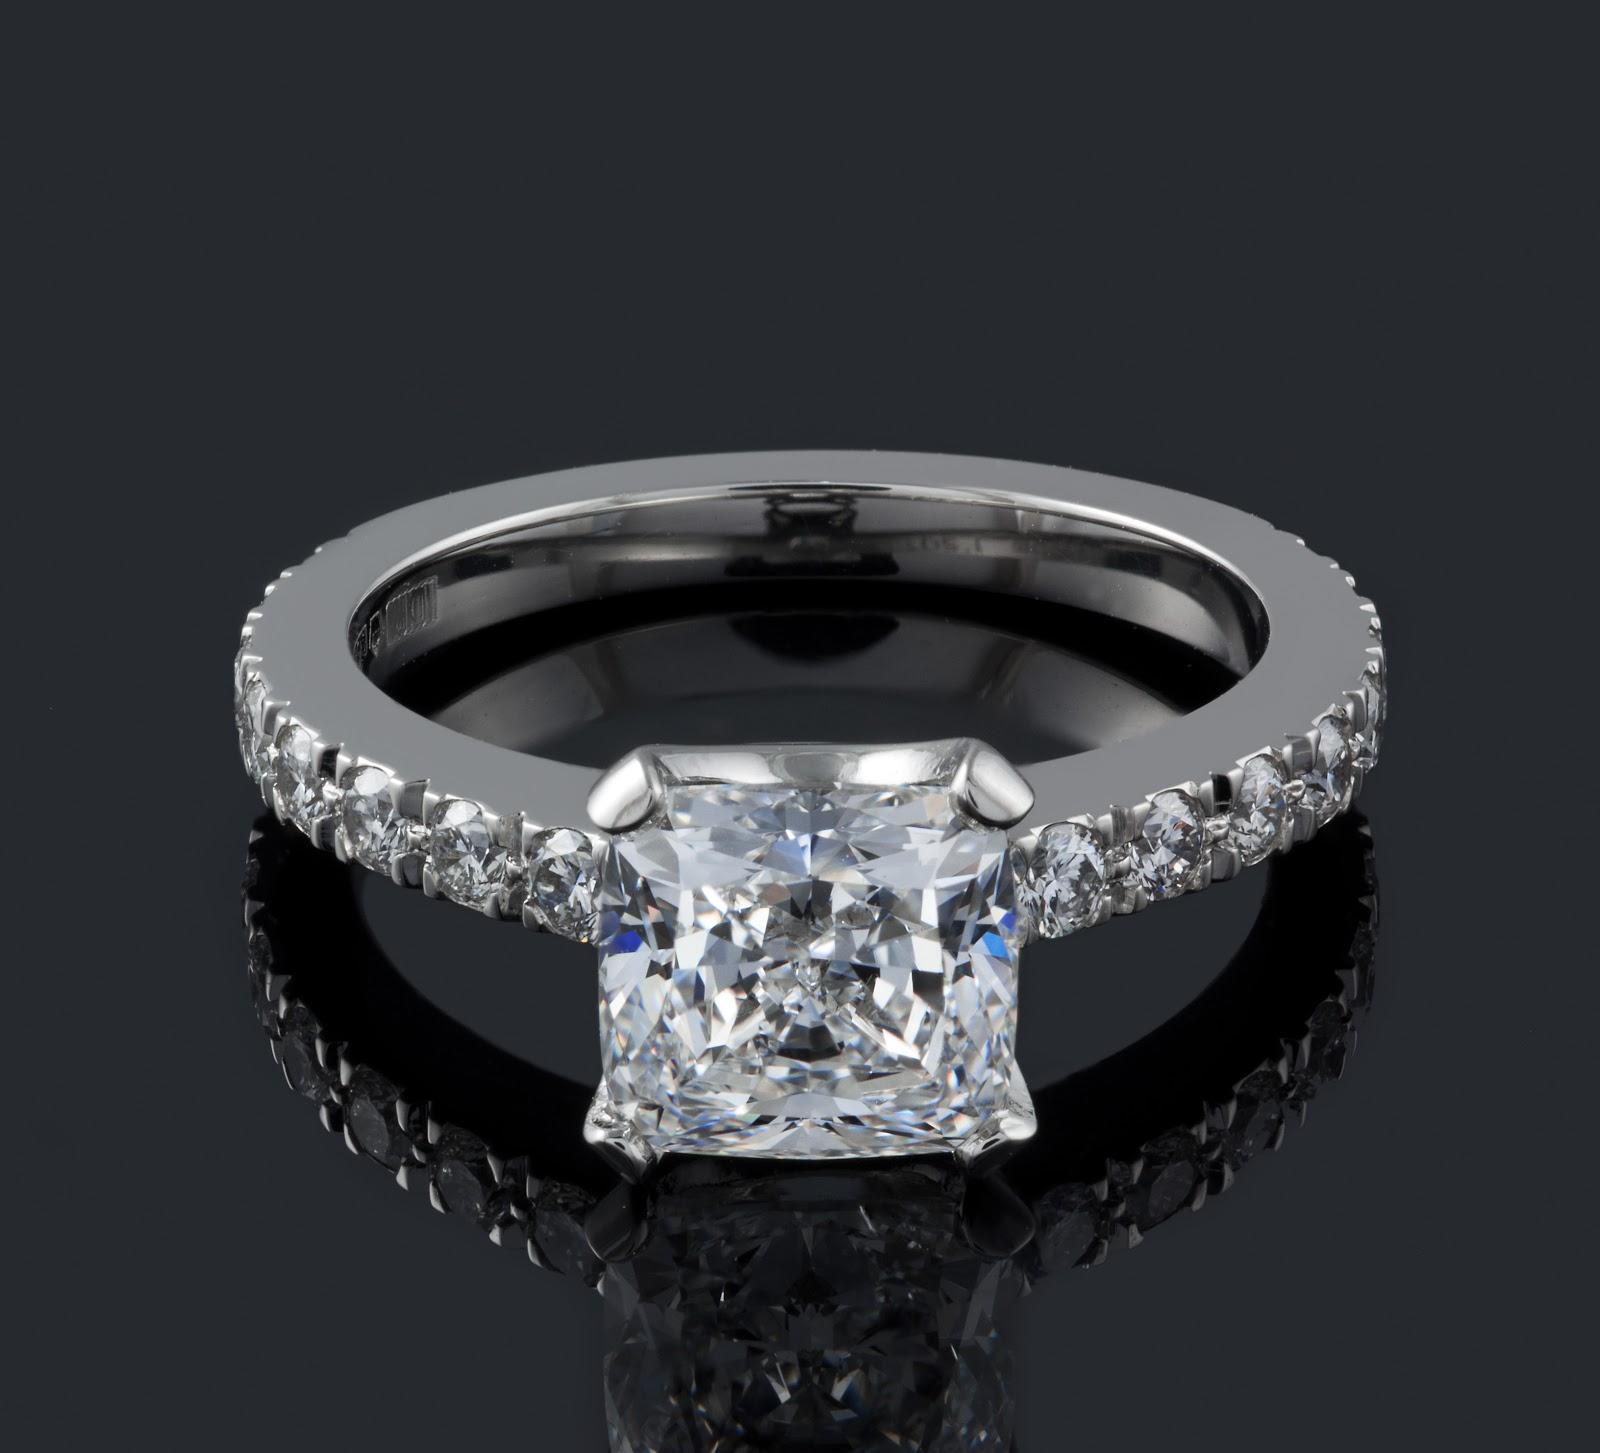 Bespoke Jewellery Blog From Daniel Prince Of London